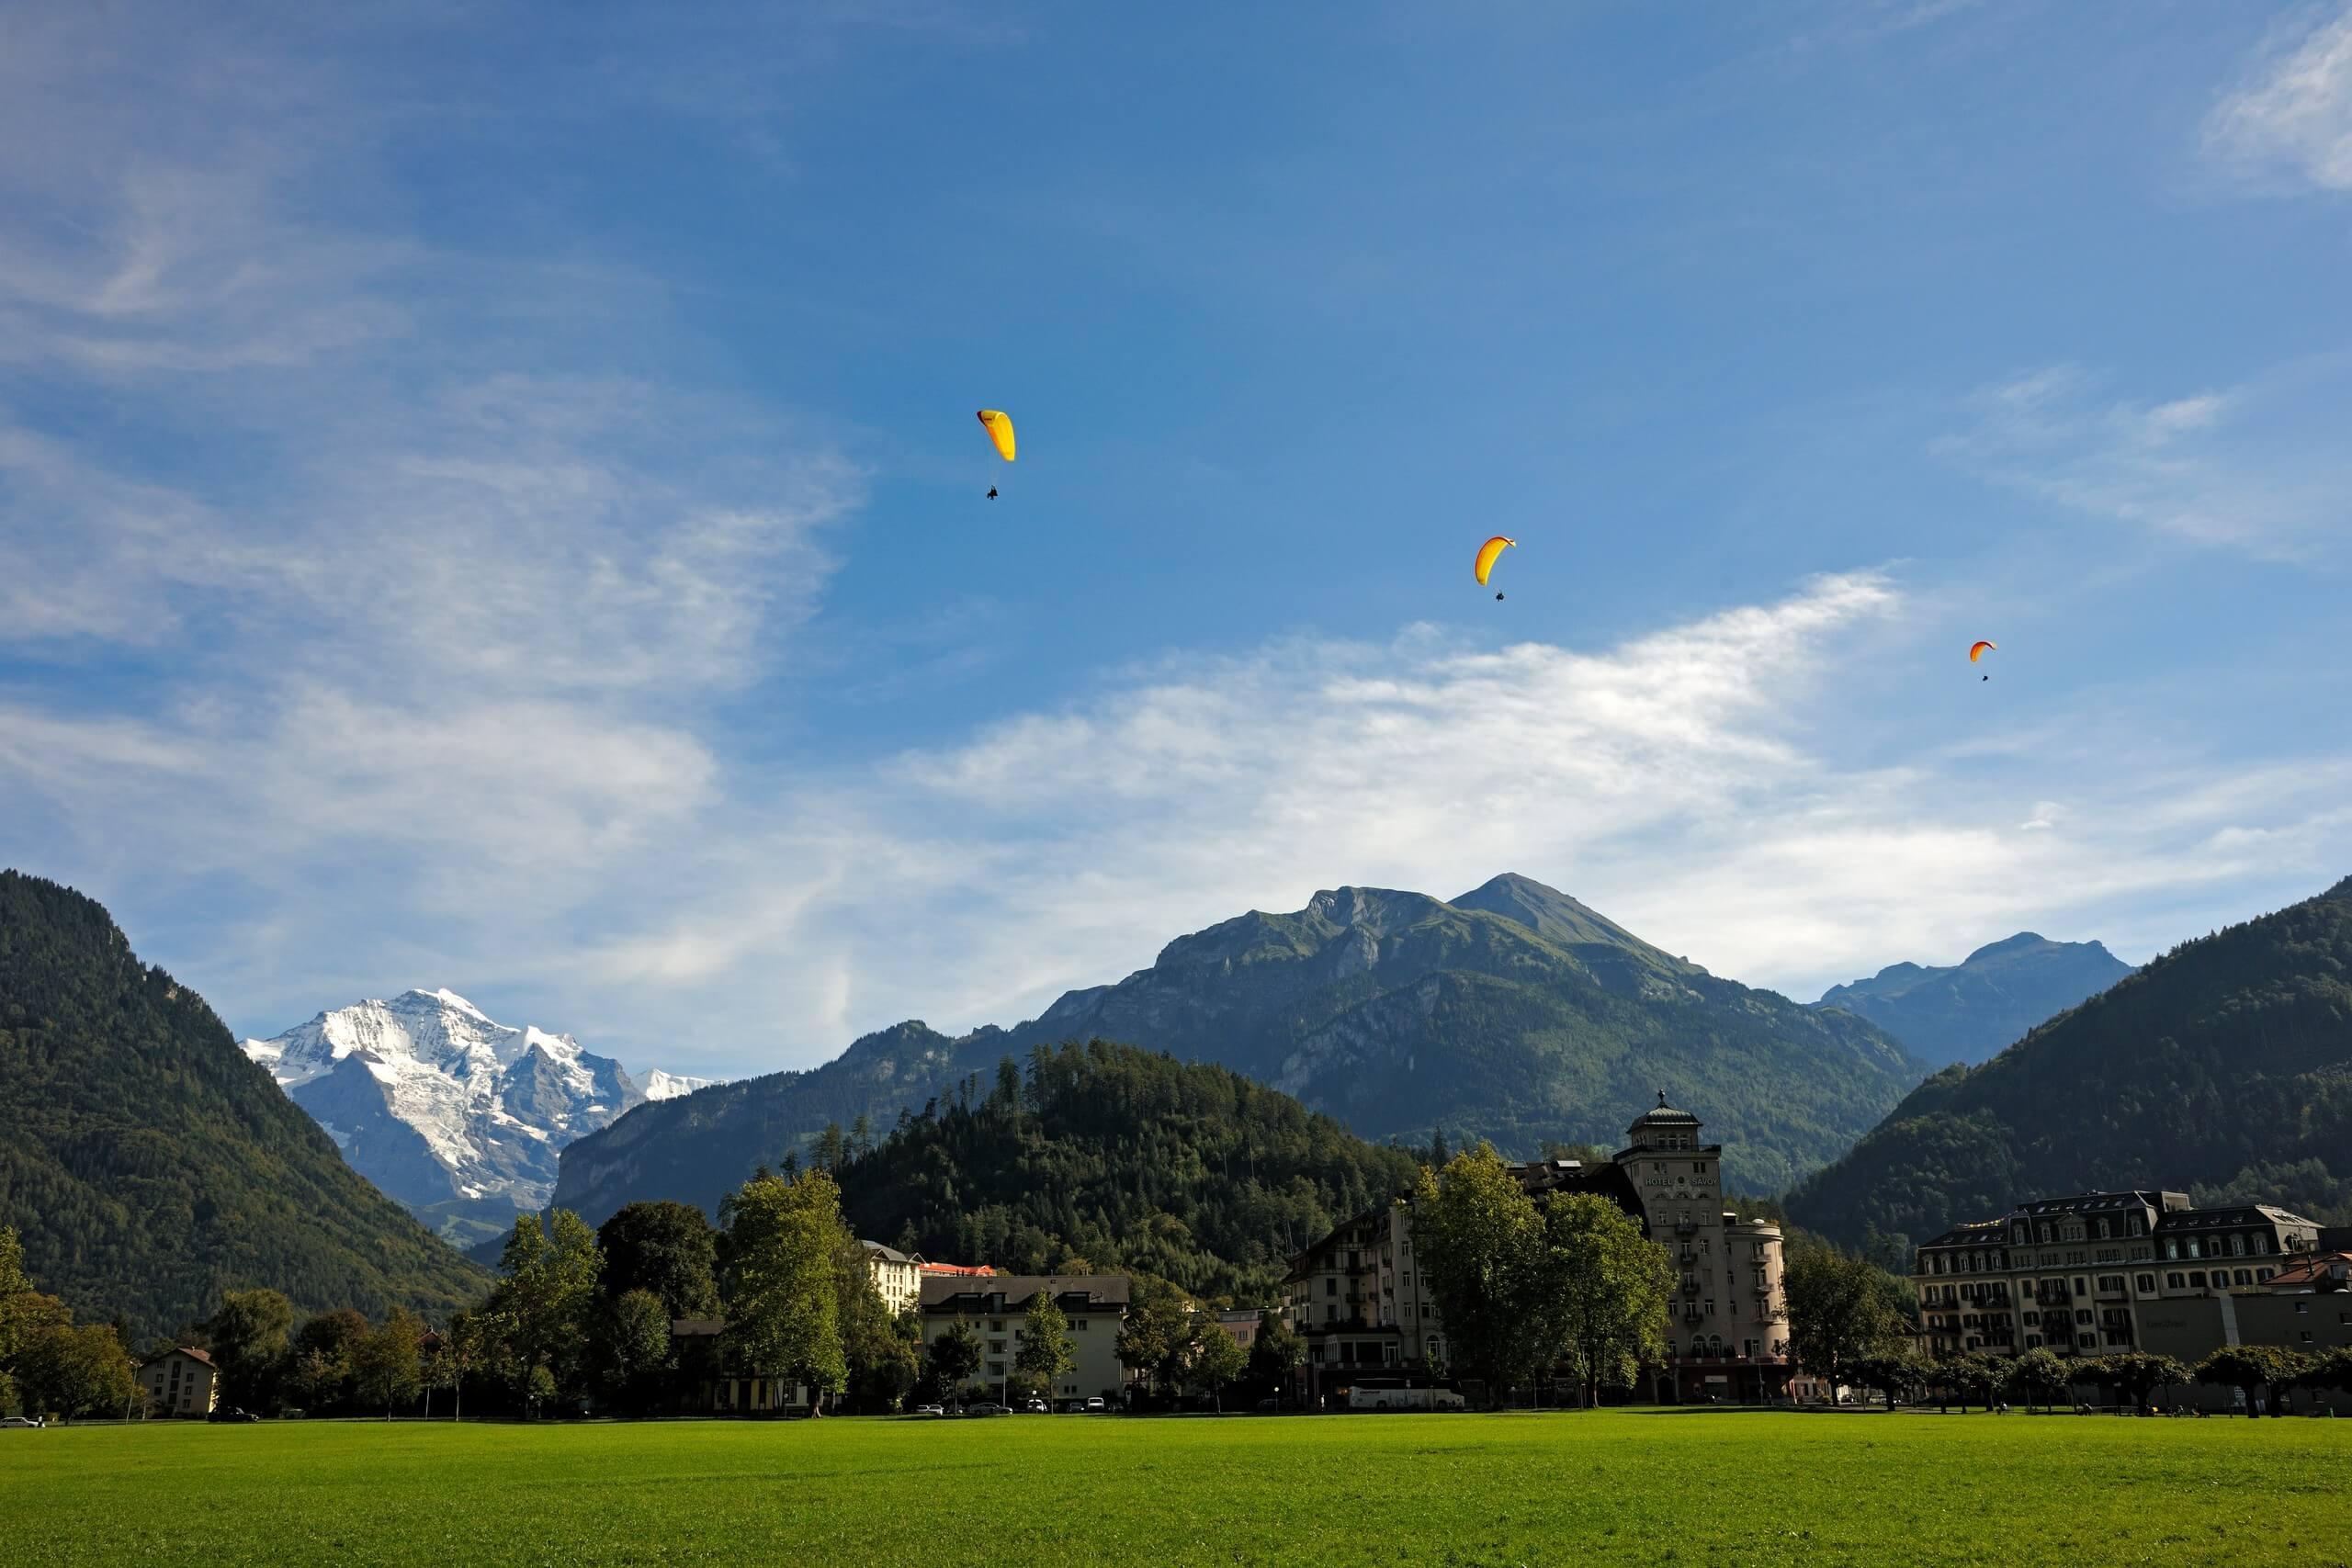 interlaken-hoehematte-sommer-jungfrau-paraglider